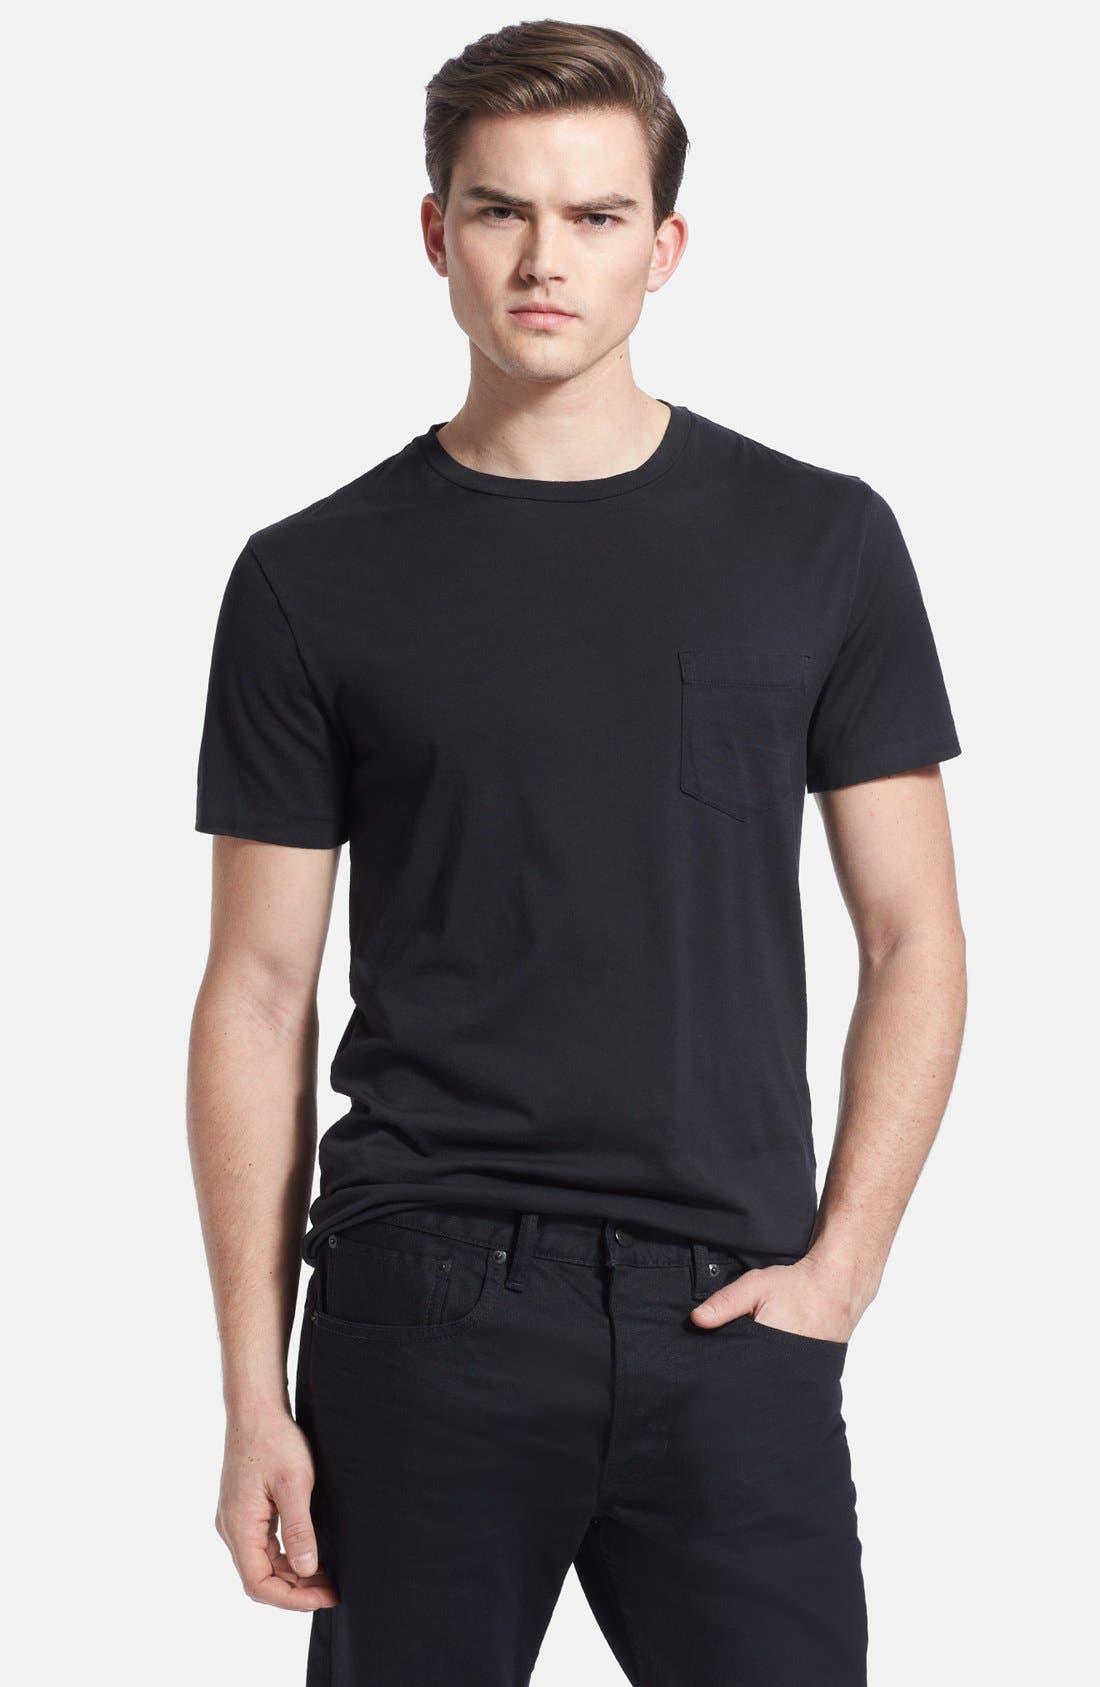 Alternate Image 1 Selected - Ralph Lauren Black Label Pima Cotton Pocket Crewneck T-Shirt